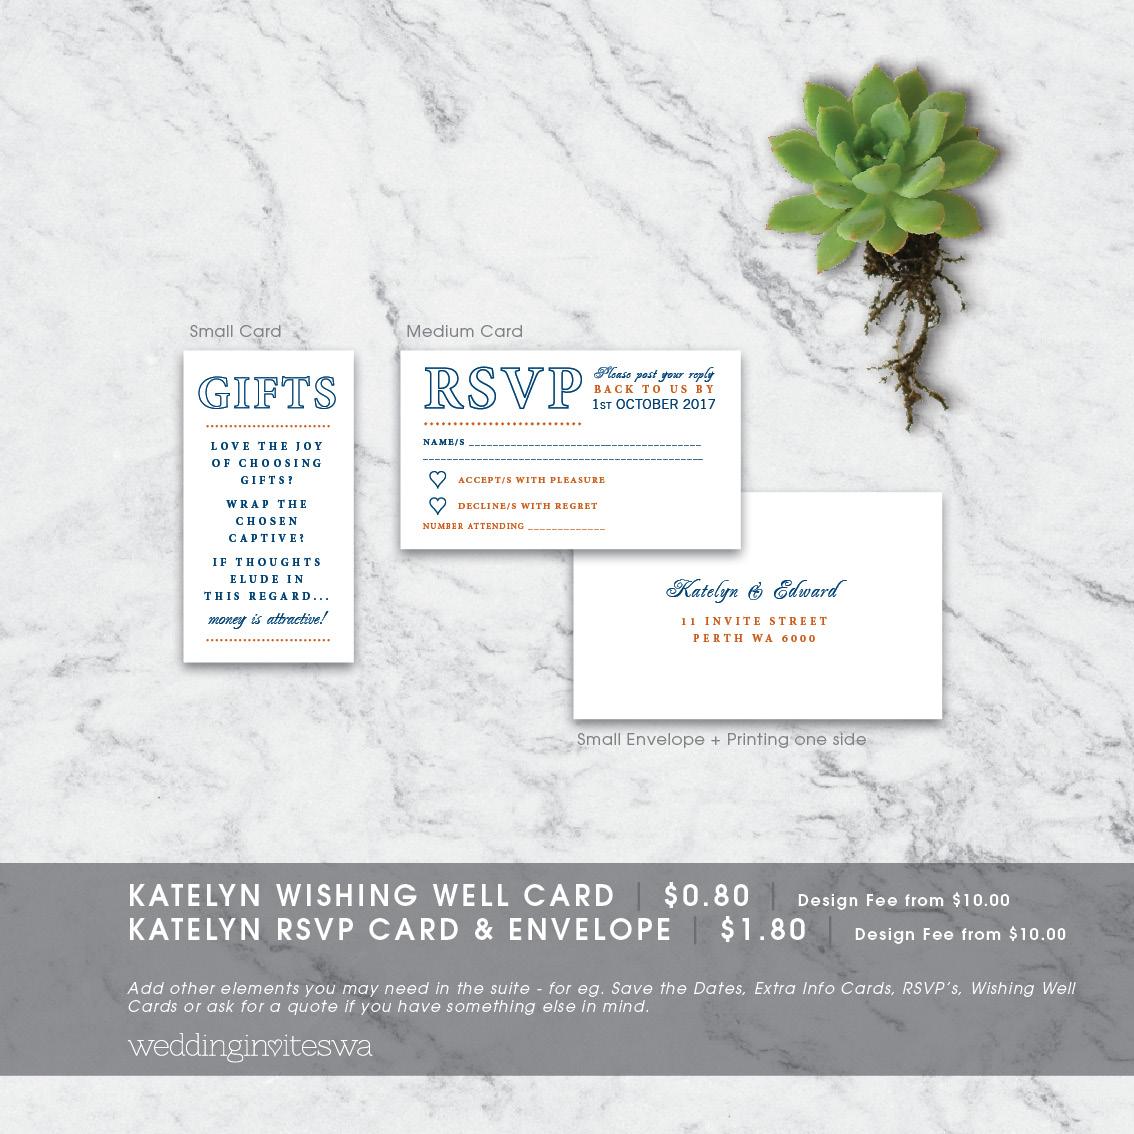 KATELYN_extra cards